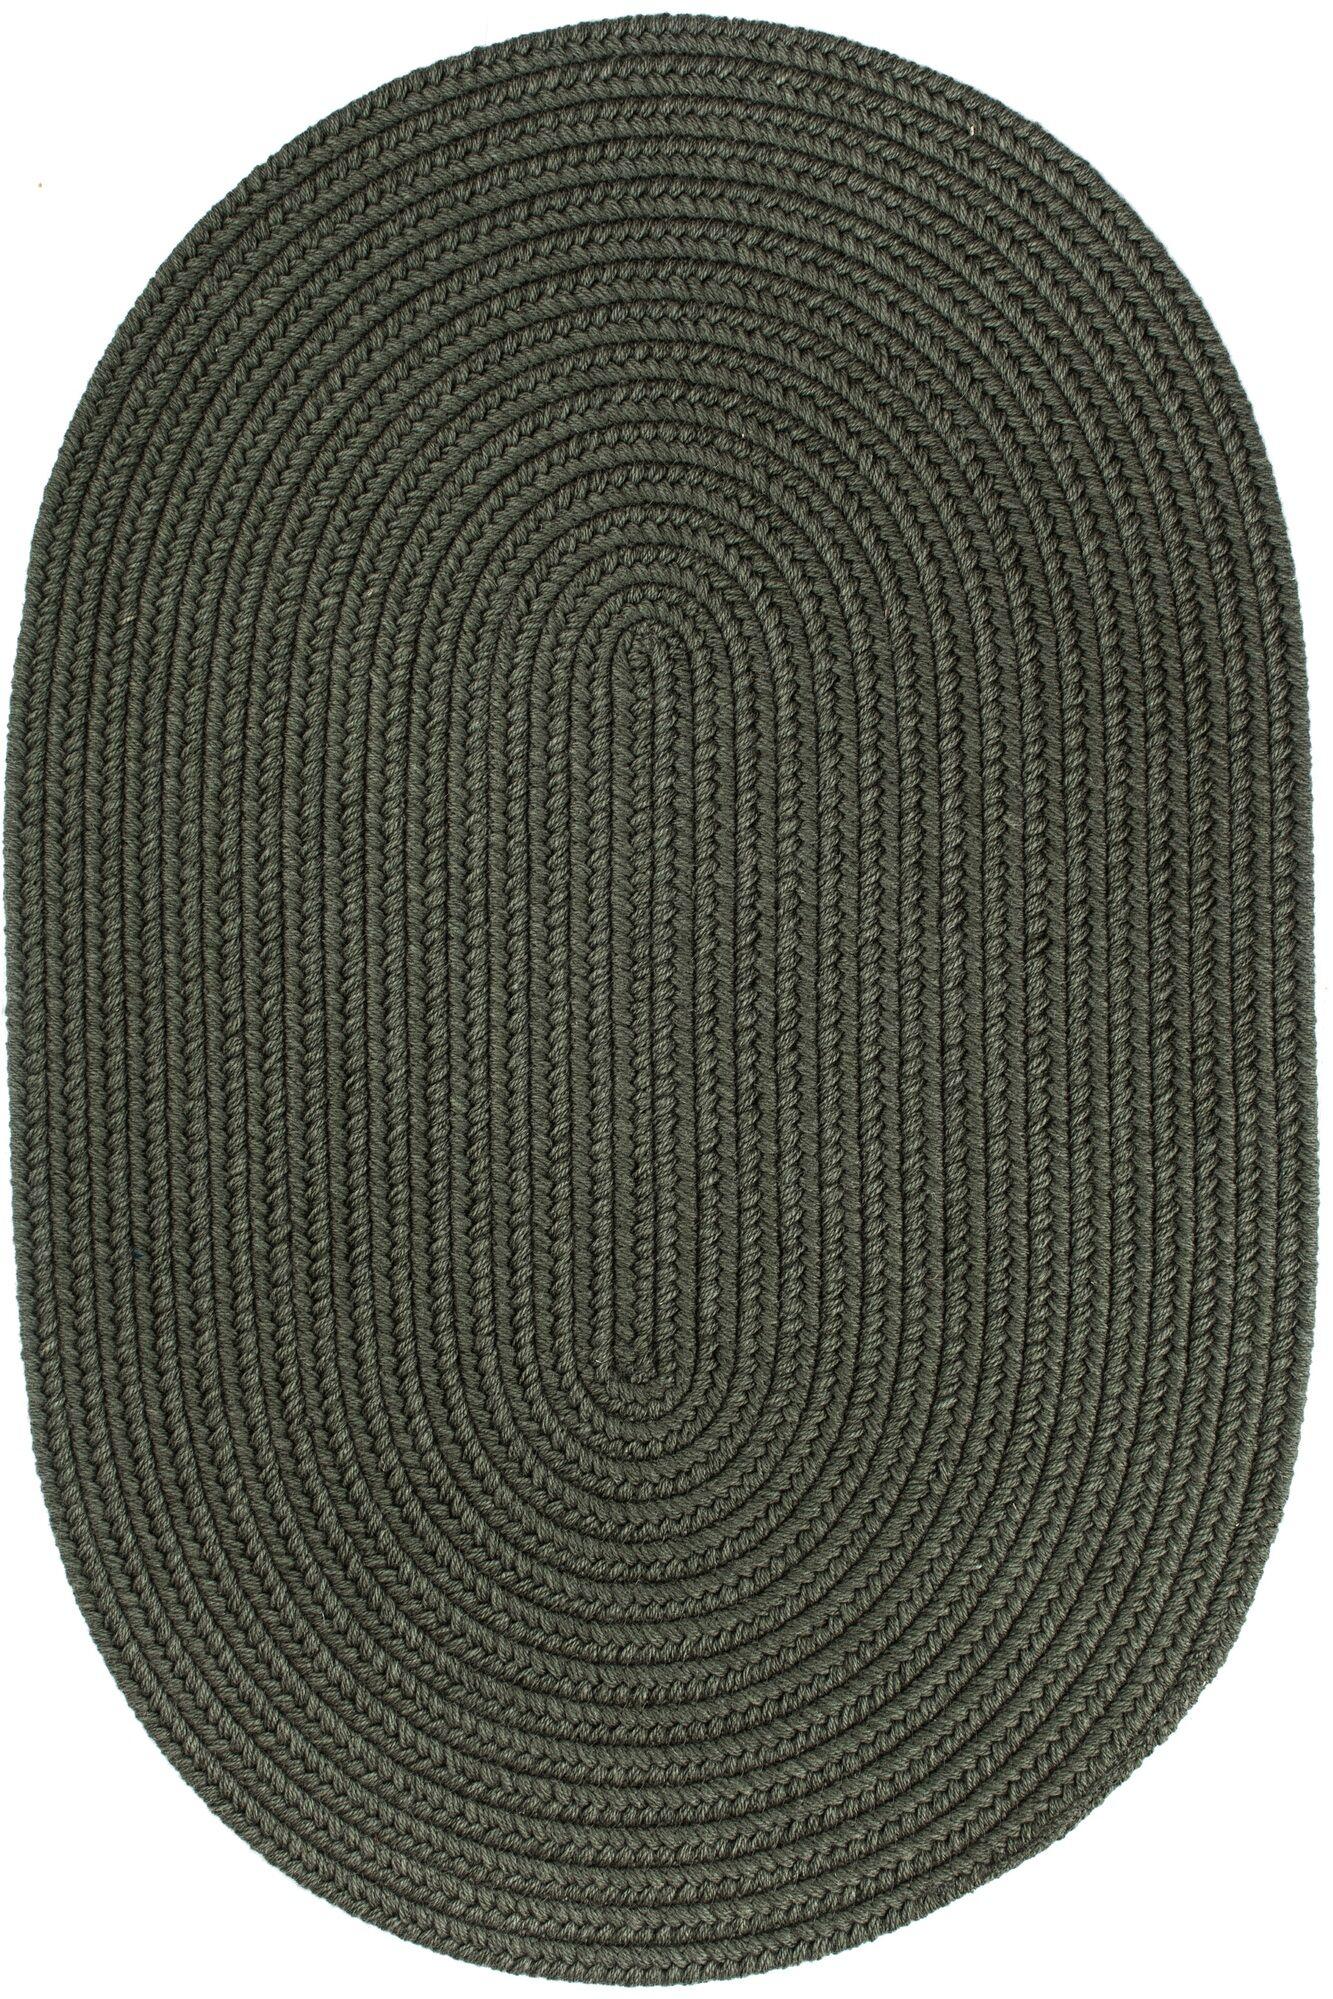 Handmade Dark Sage Area Rug Rug Size: Oval  4' x 6'